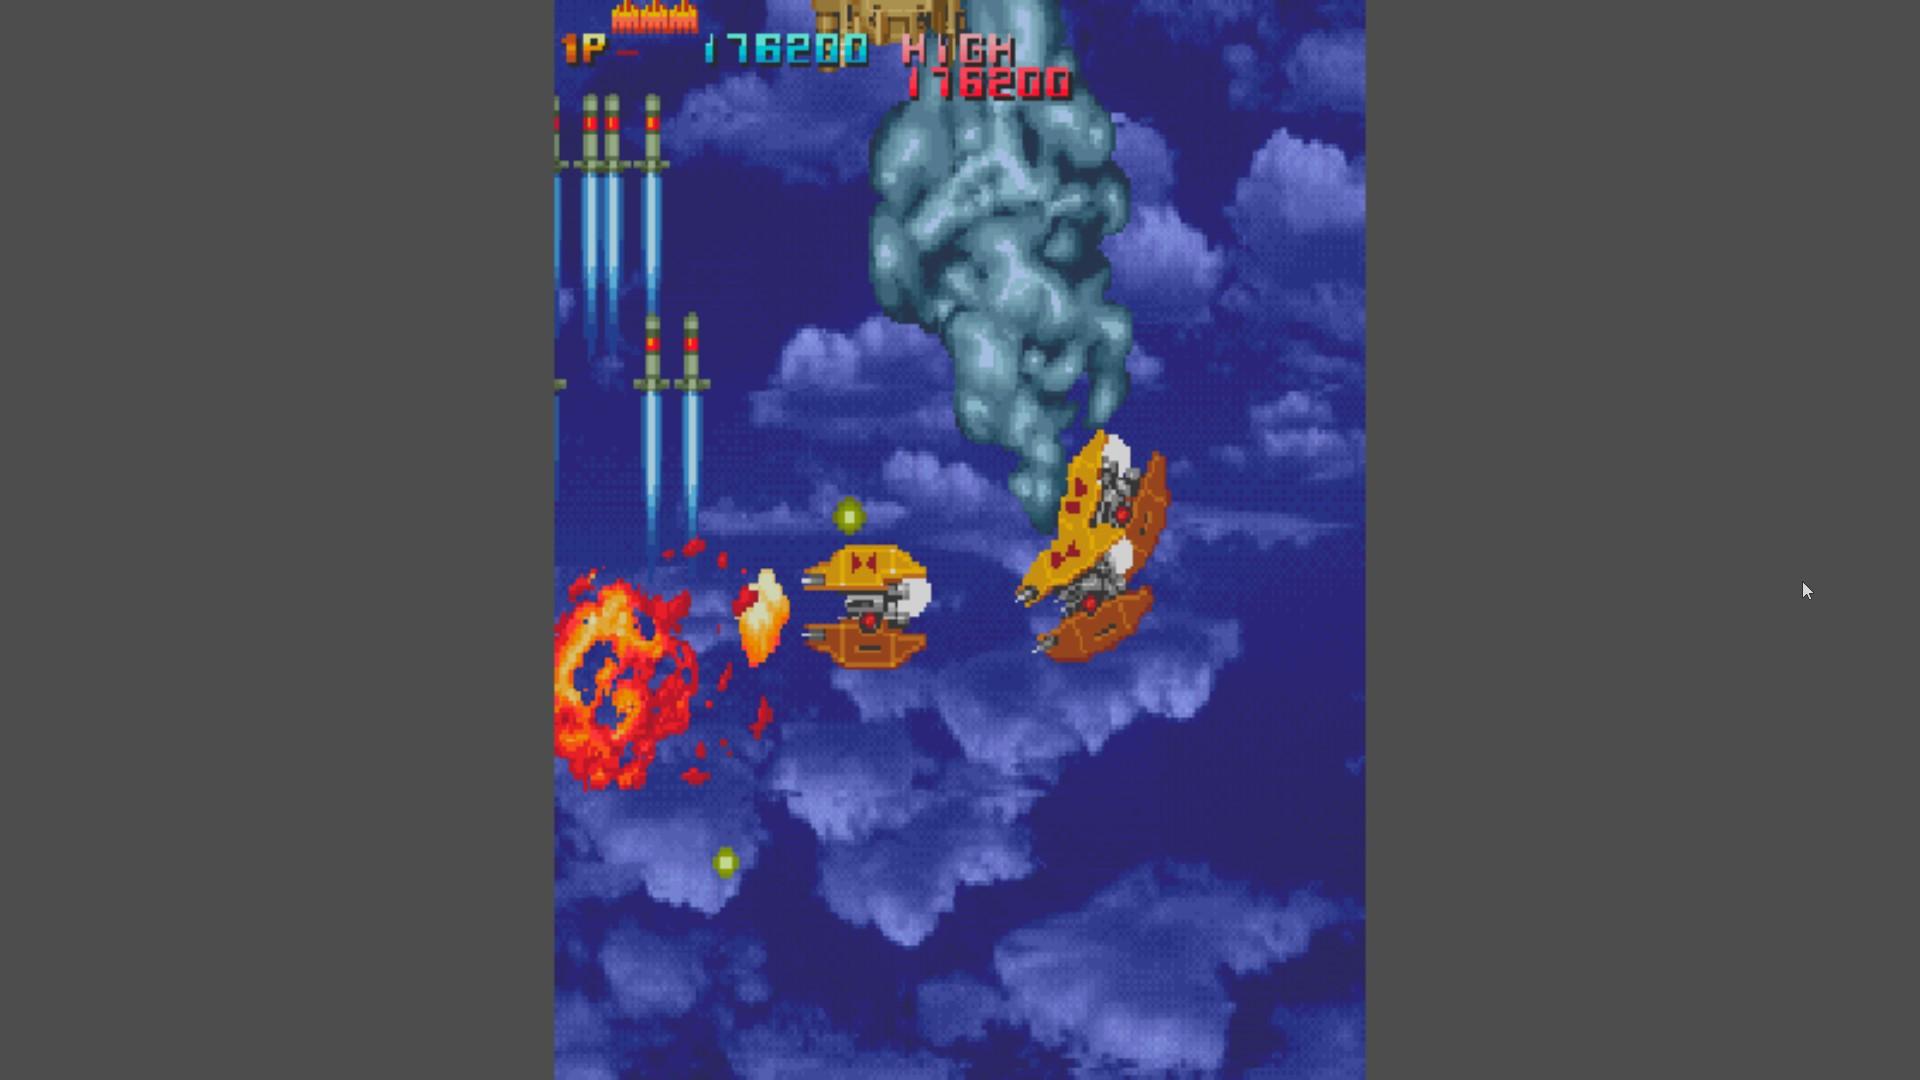 AkinNahtanoj: Air Attack [airattck] (Arcade Emulated / M.A.M.E.) 176,200 points on 2020-10-09 03:50:14